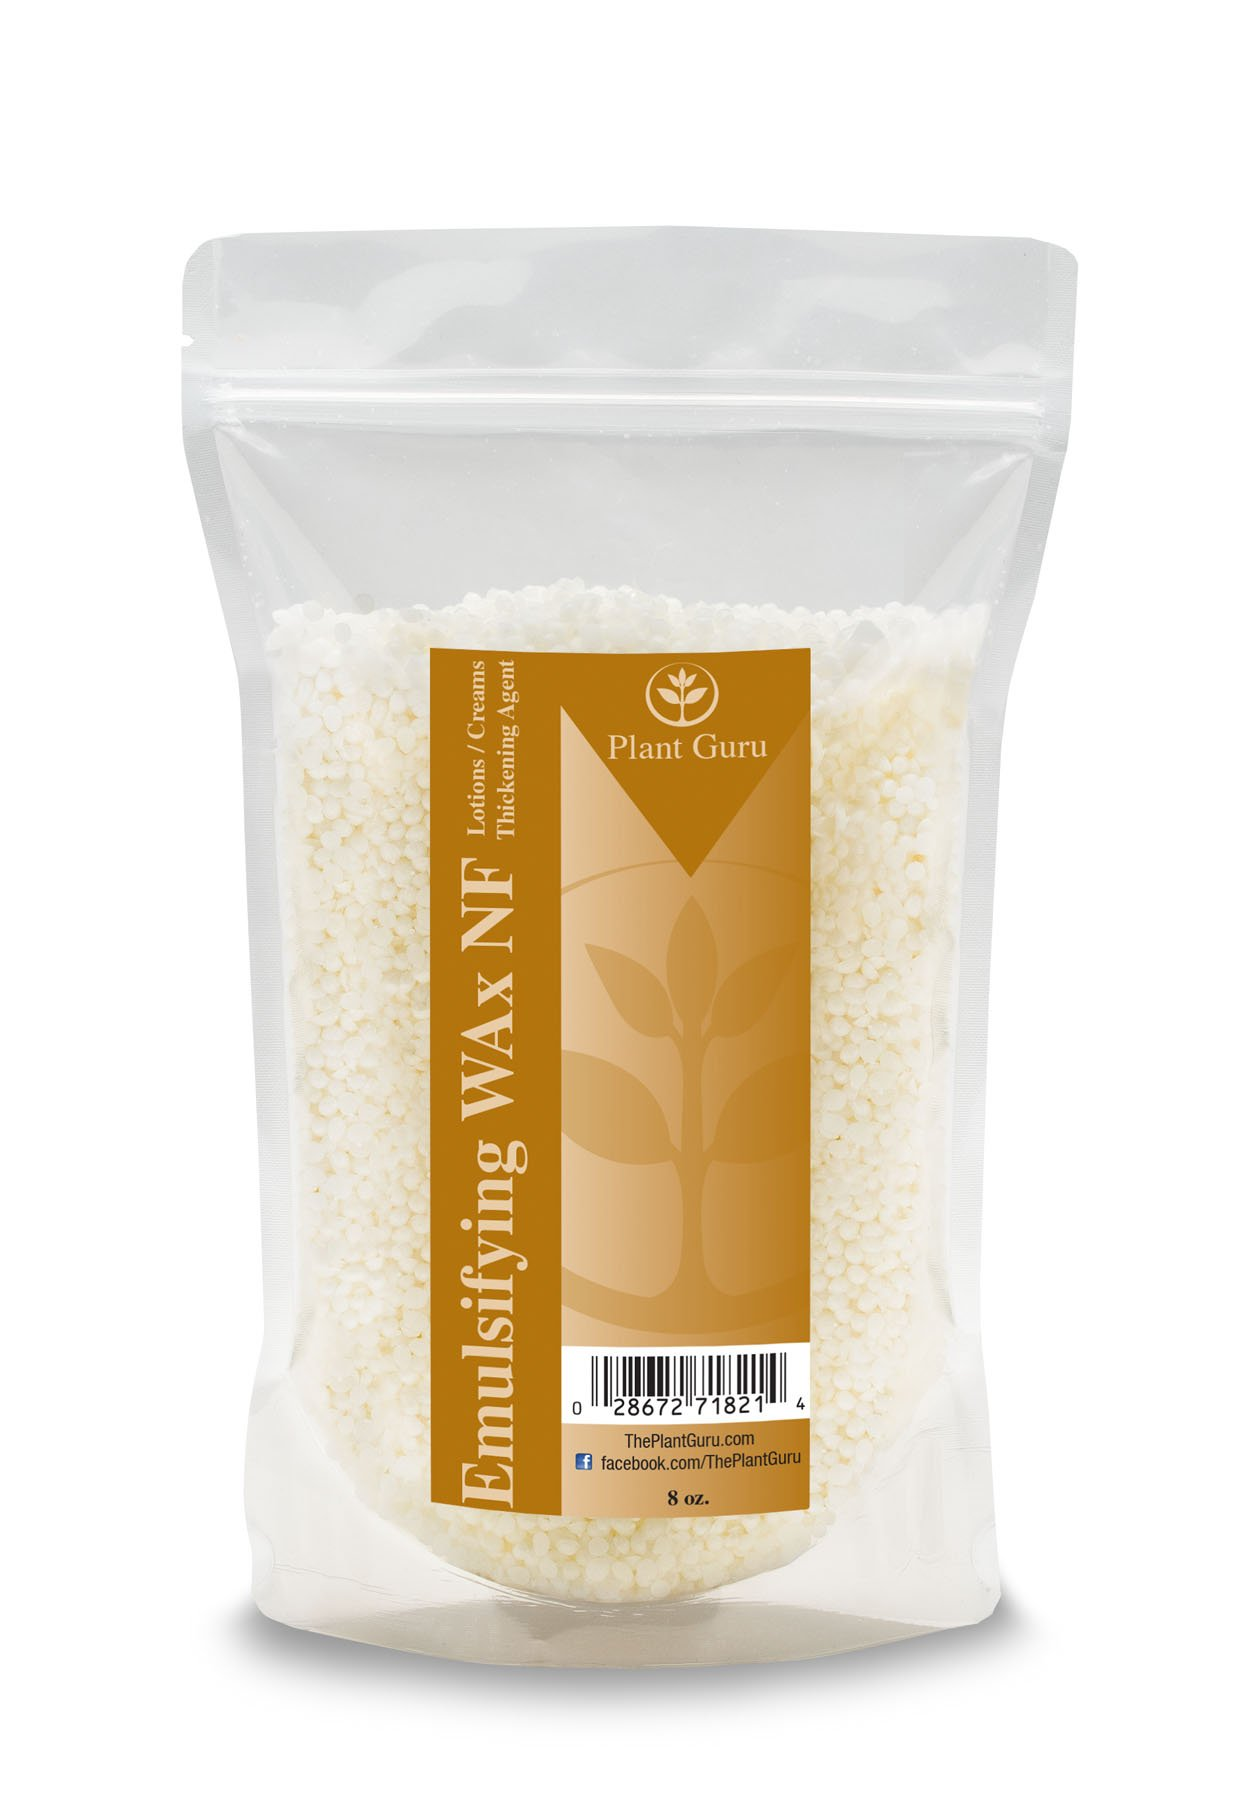 Emulsifying Wax NF, Non-GMO Premium Quality Polysorbate 60/ Polawax 8 oz.